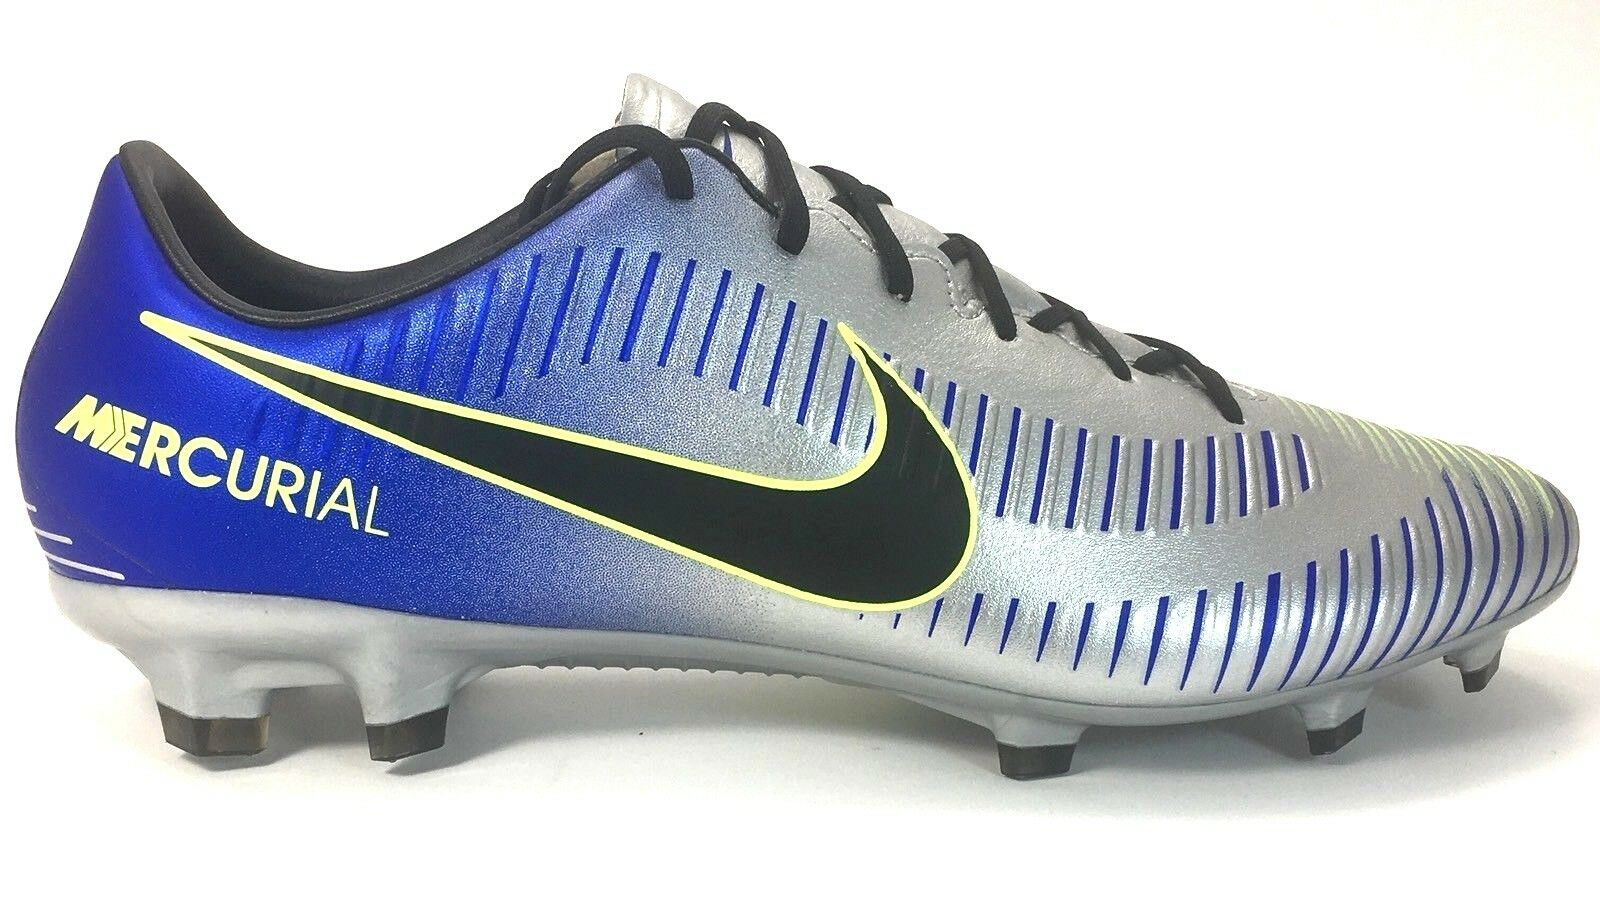 97770471e23 Nike Mercurial VELOCE III NJR FG Men s Size 9 Soccer Cleats 921505 ...